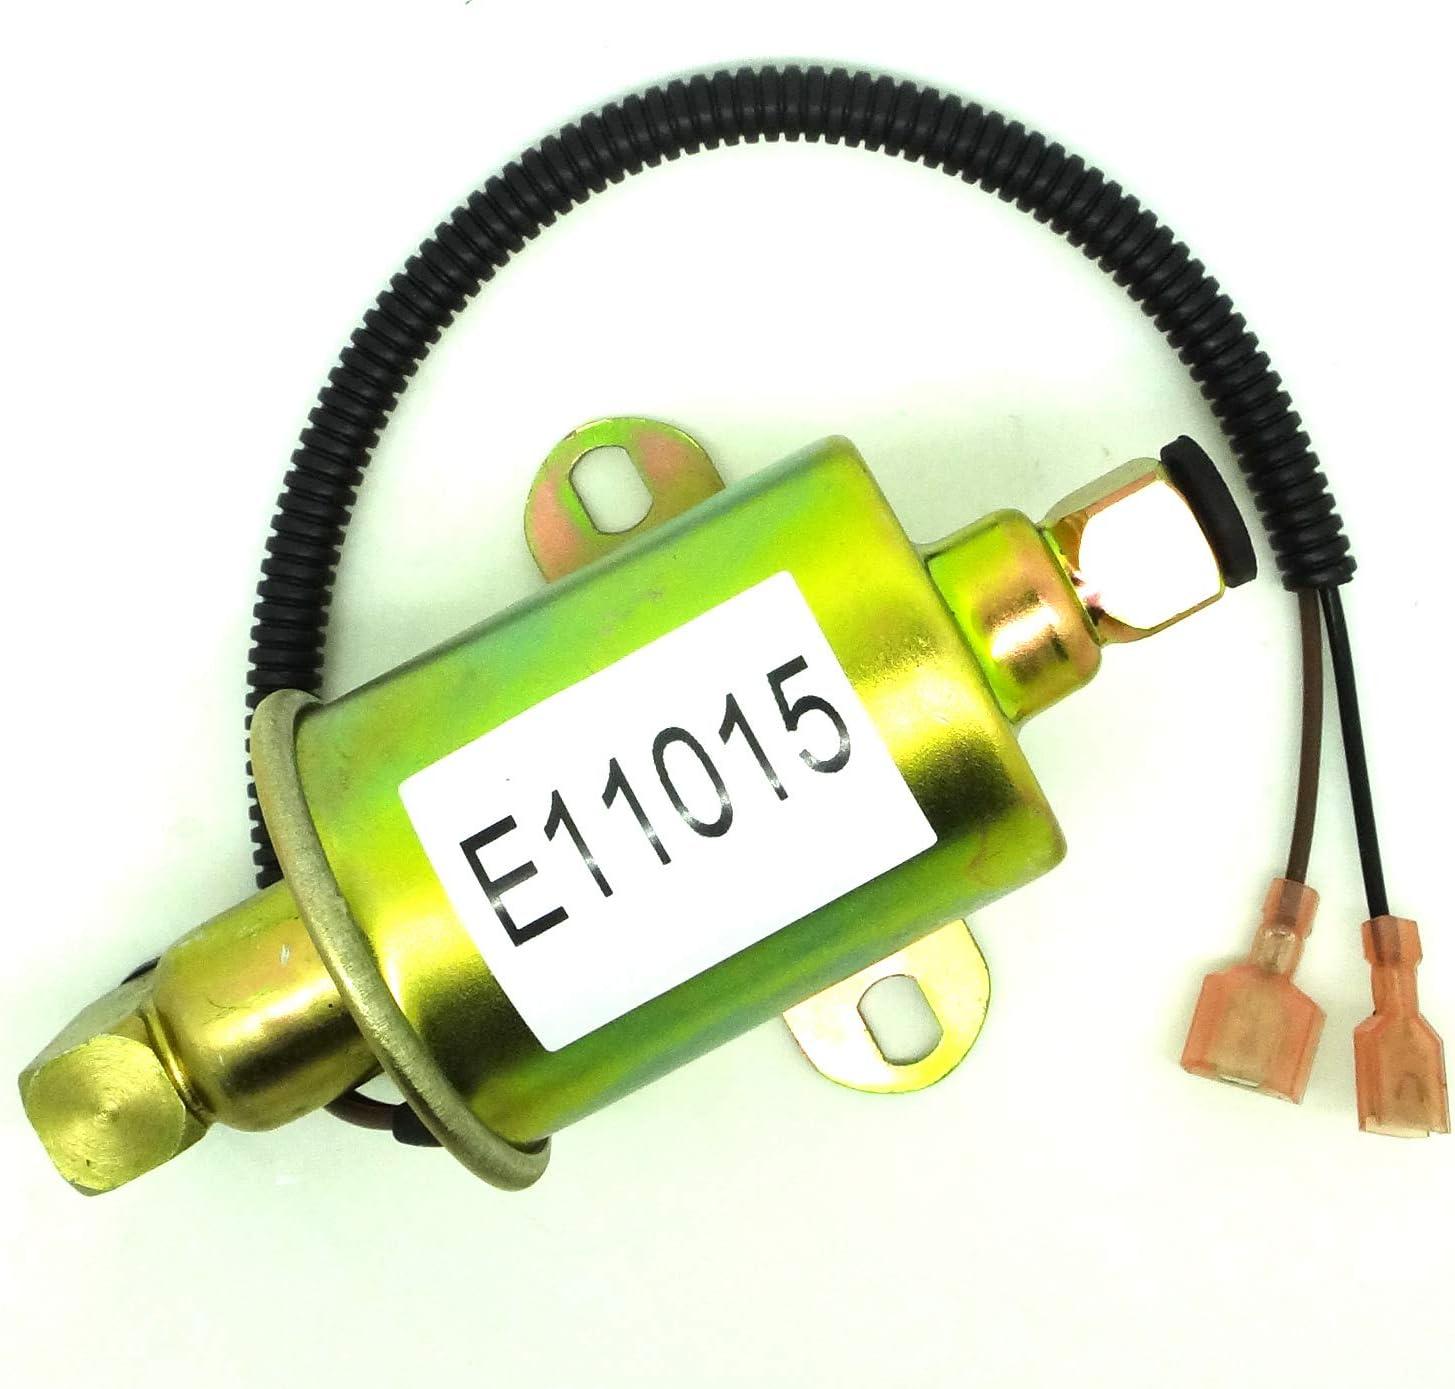 Alician Automotive Accessories Electrical Fuel Pump 149-2620 A029F887 A047N929 for Onan Cummins